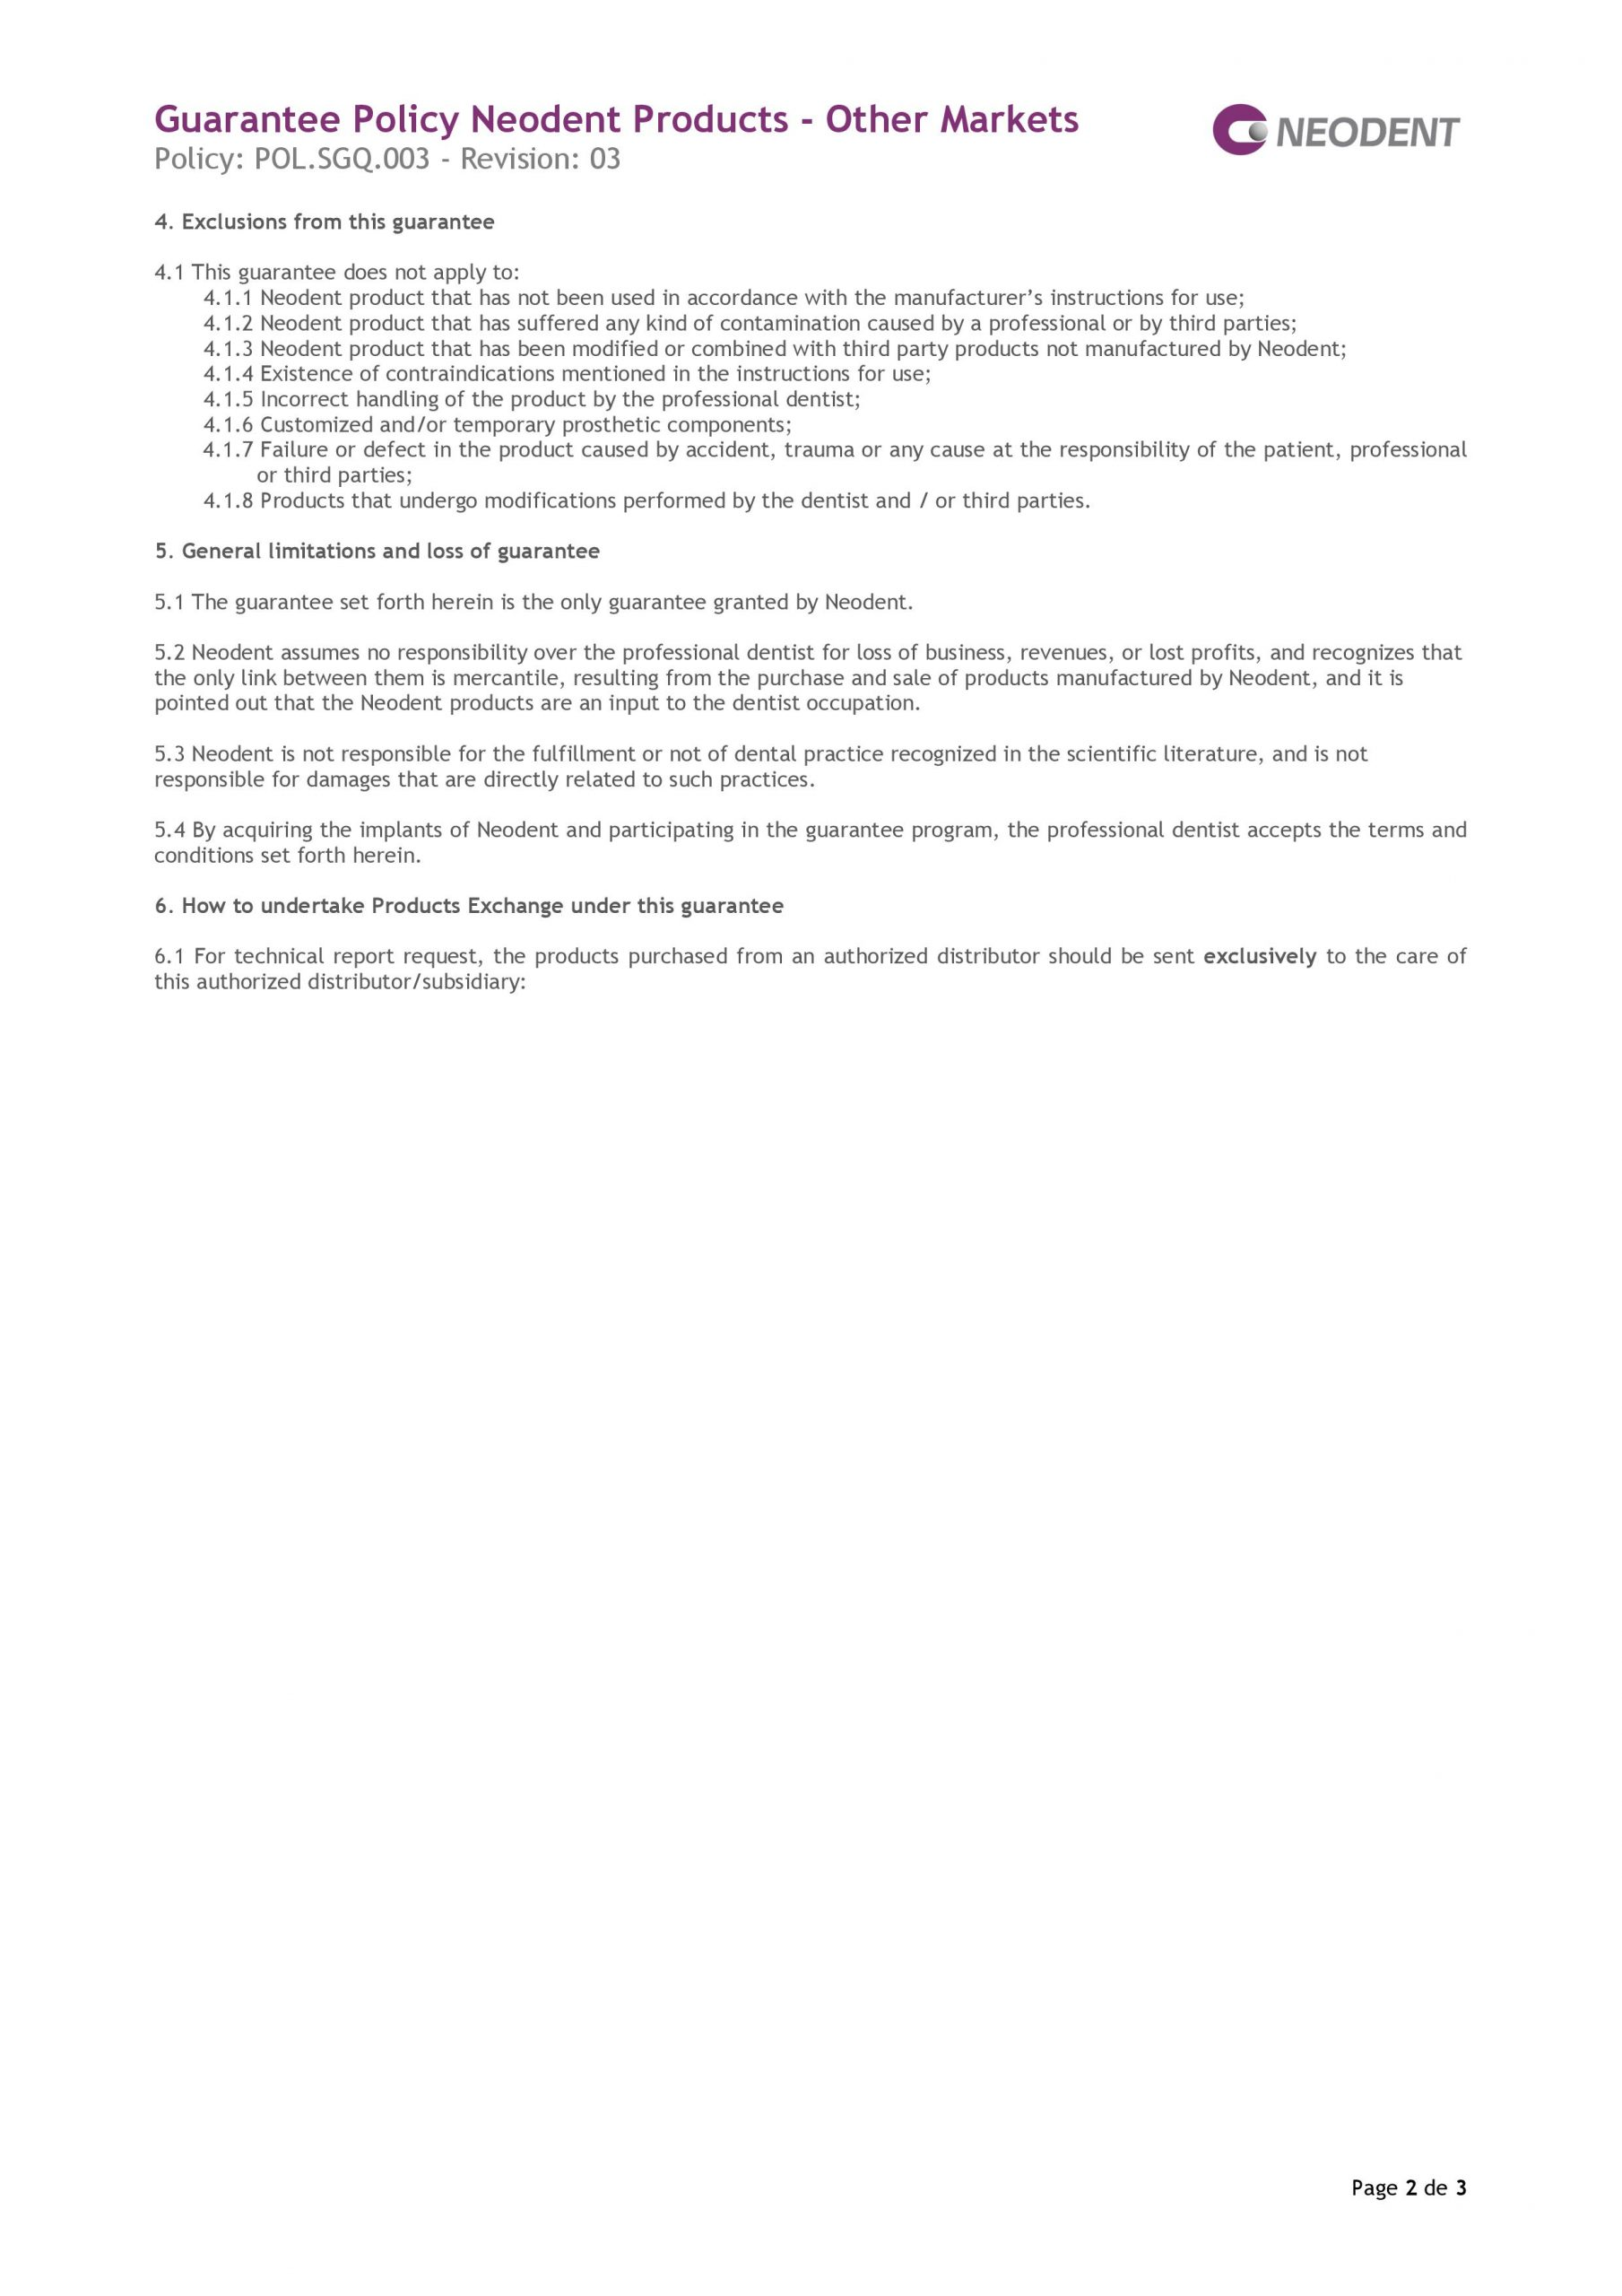 politica-garantie-implant-neodent-page